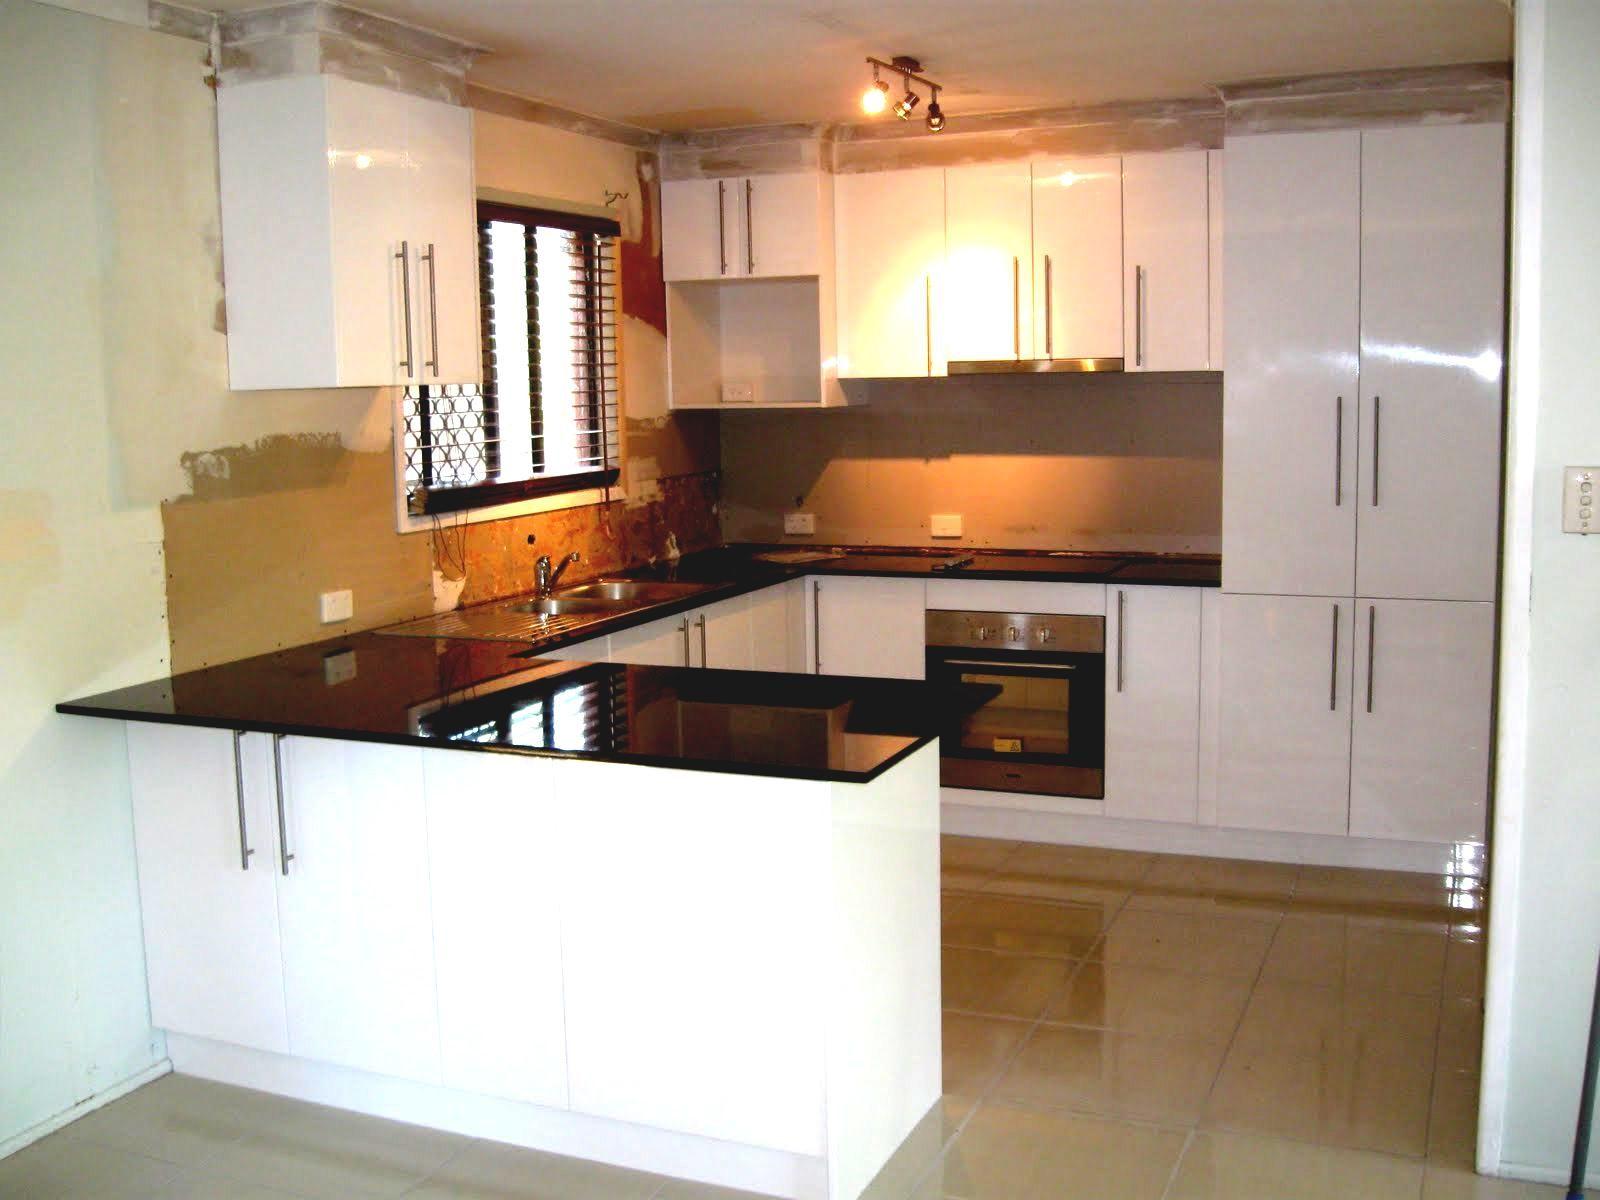 Wunderbar Eisenschwarzoxid Küche Anhänger Beleuchtung Fotos - Ideen ...